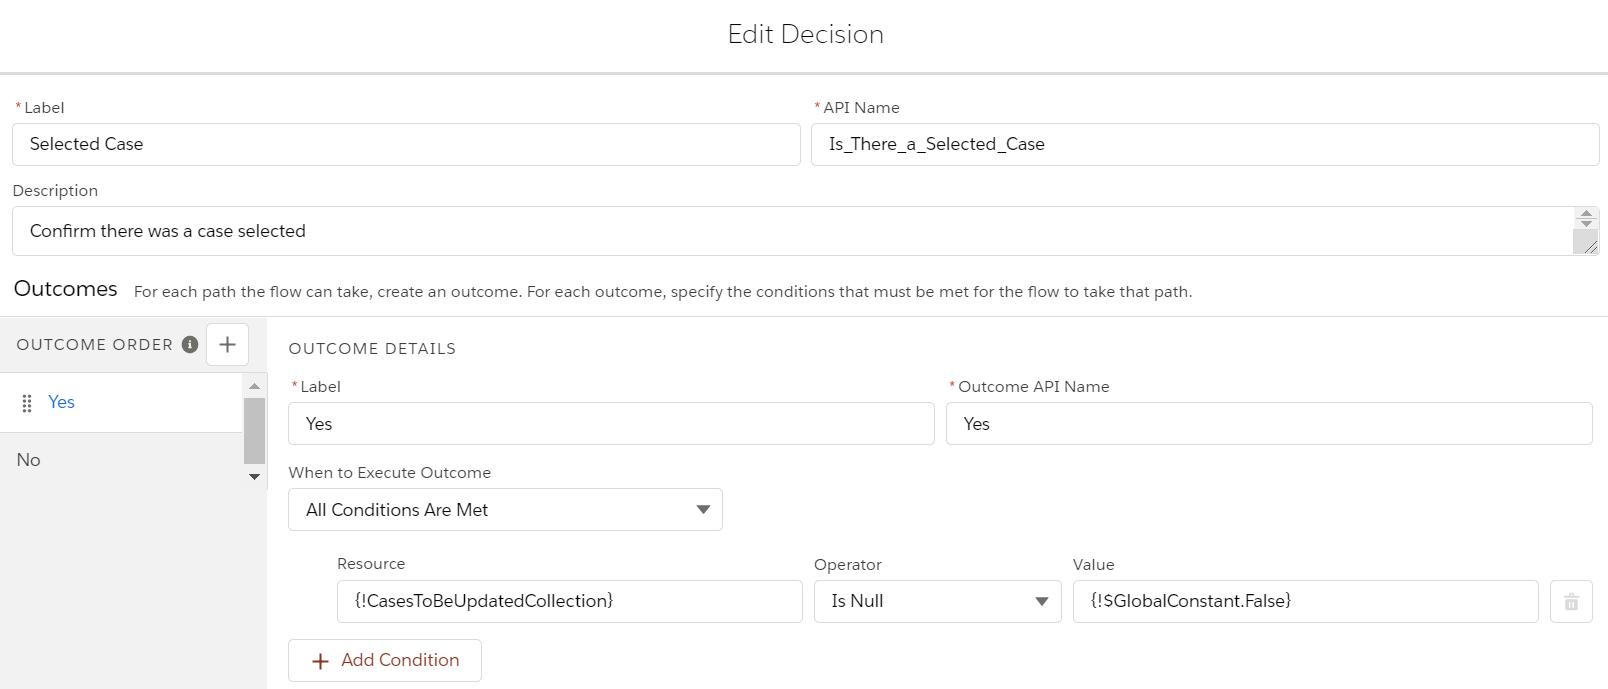 ViewAndEditOpenCaseFlow-Decision2.PNG